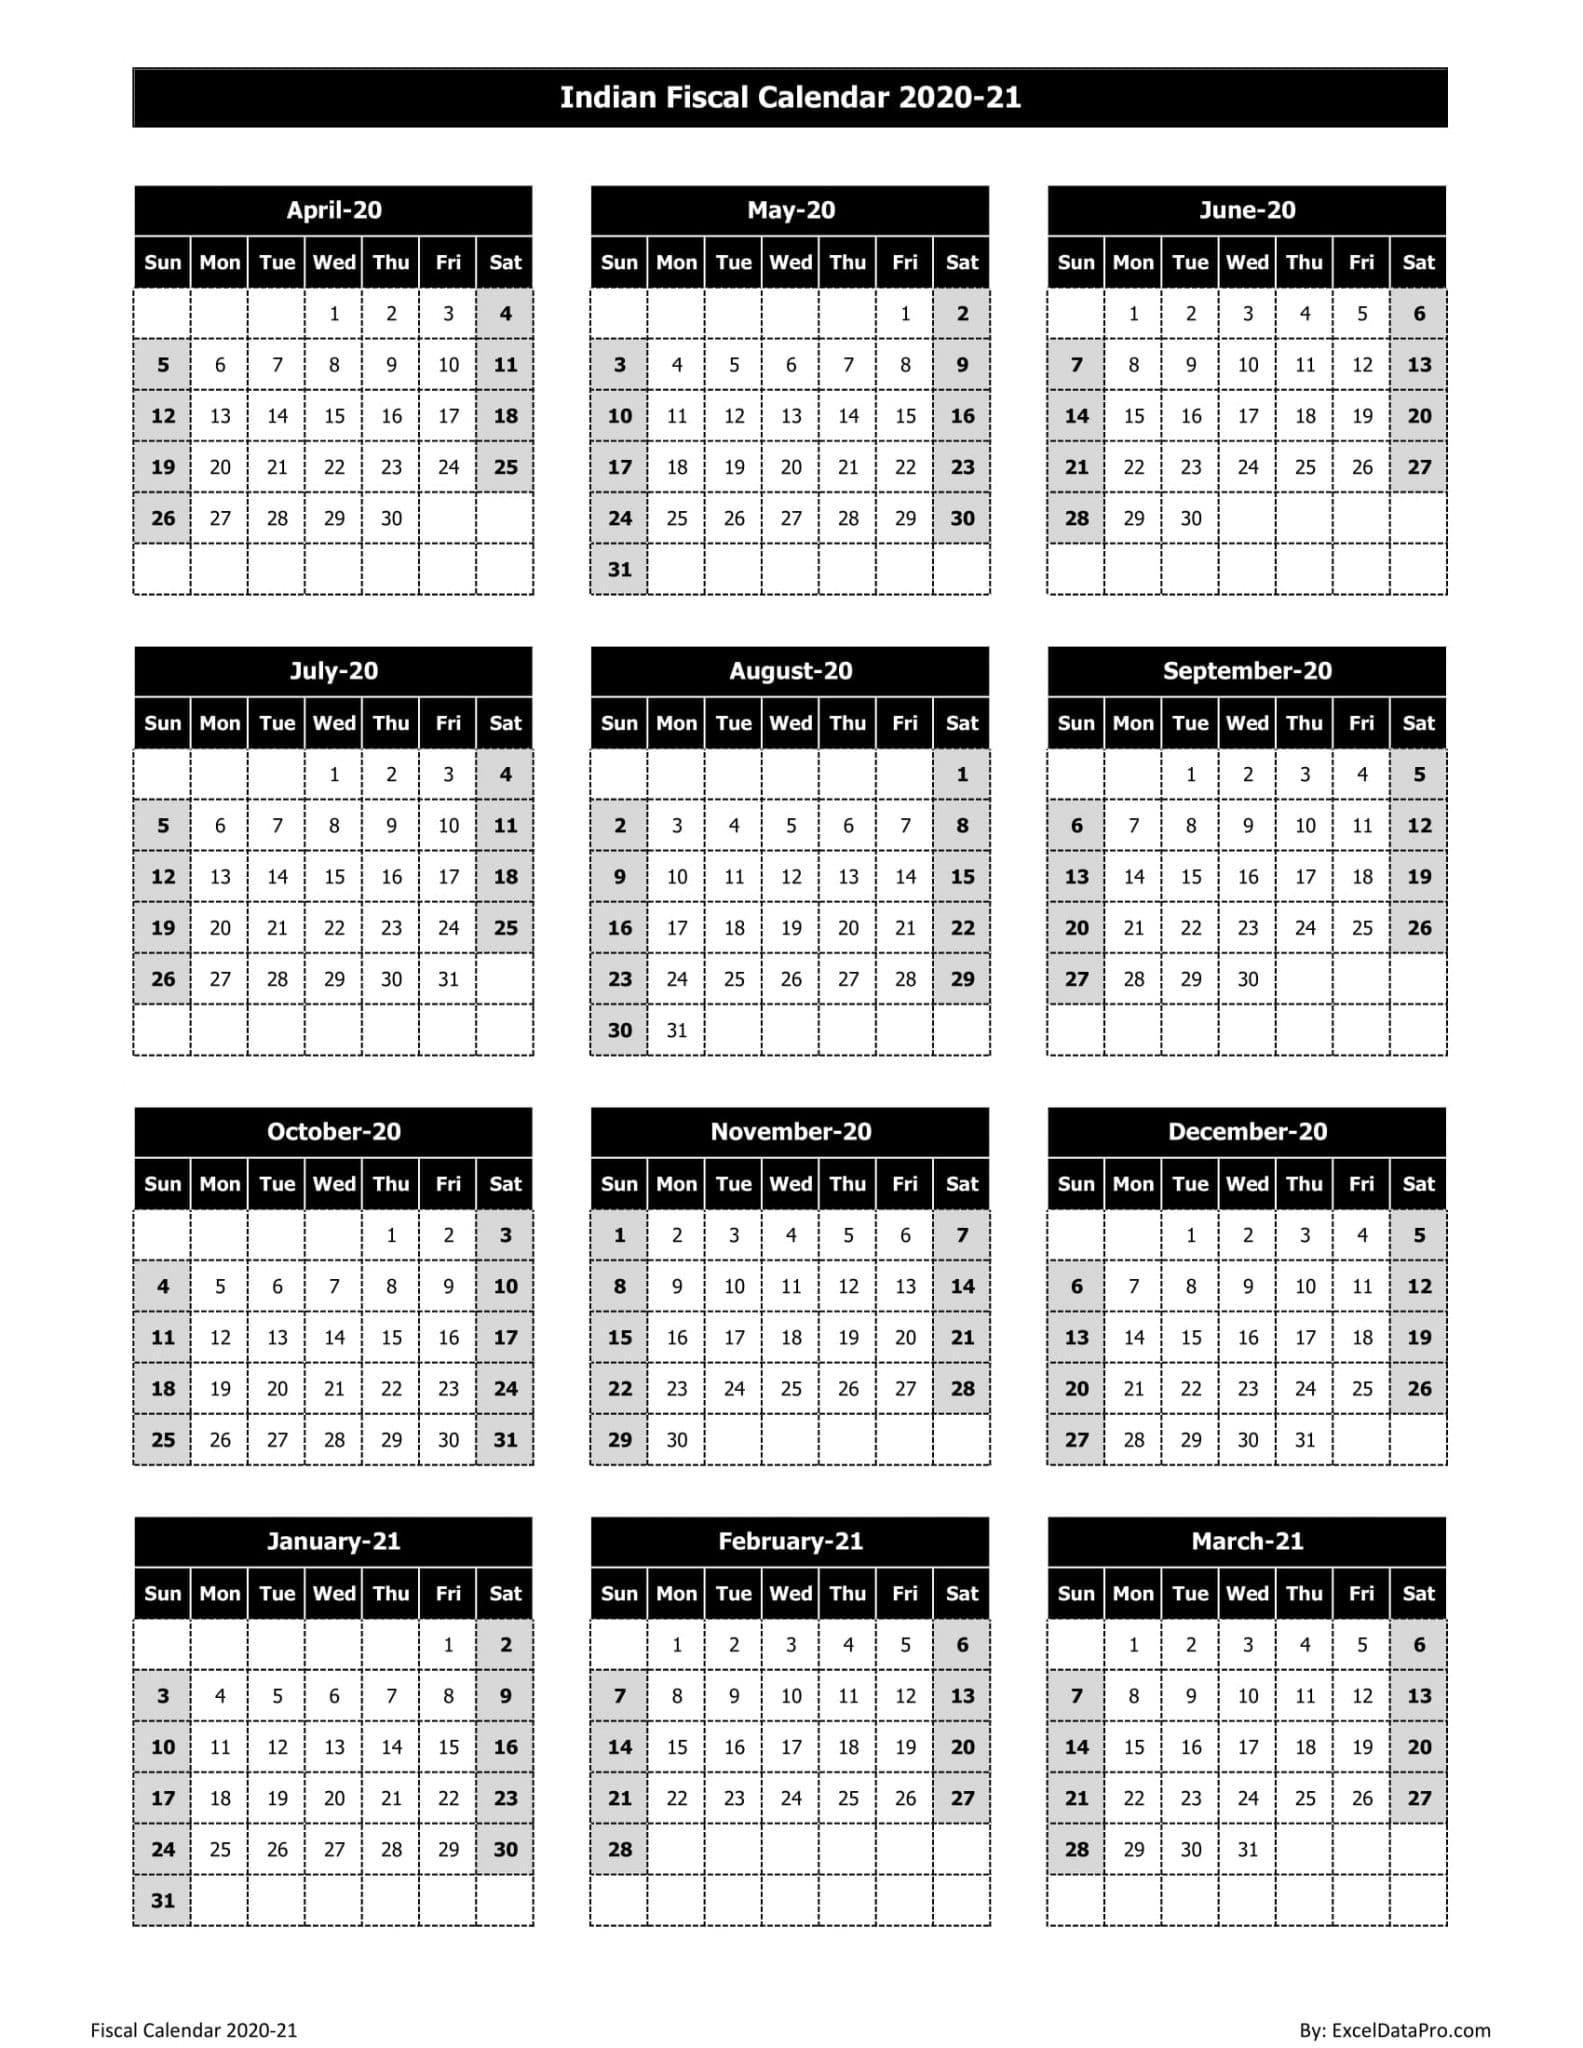 Indian Fiscal Calendar 2020-21 - Black & White